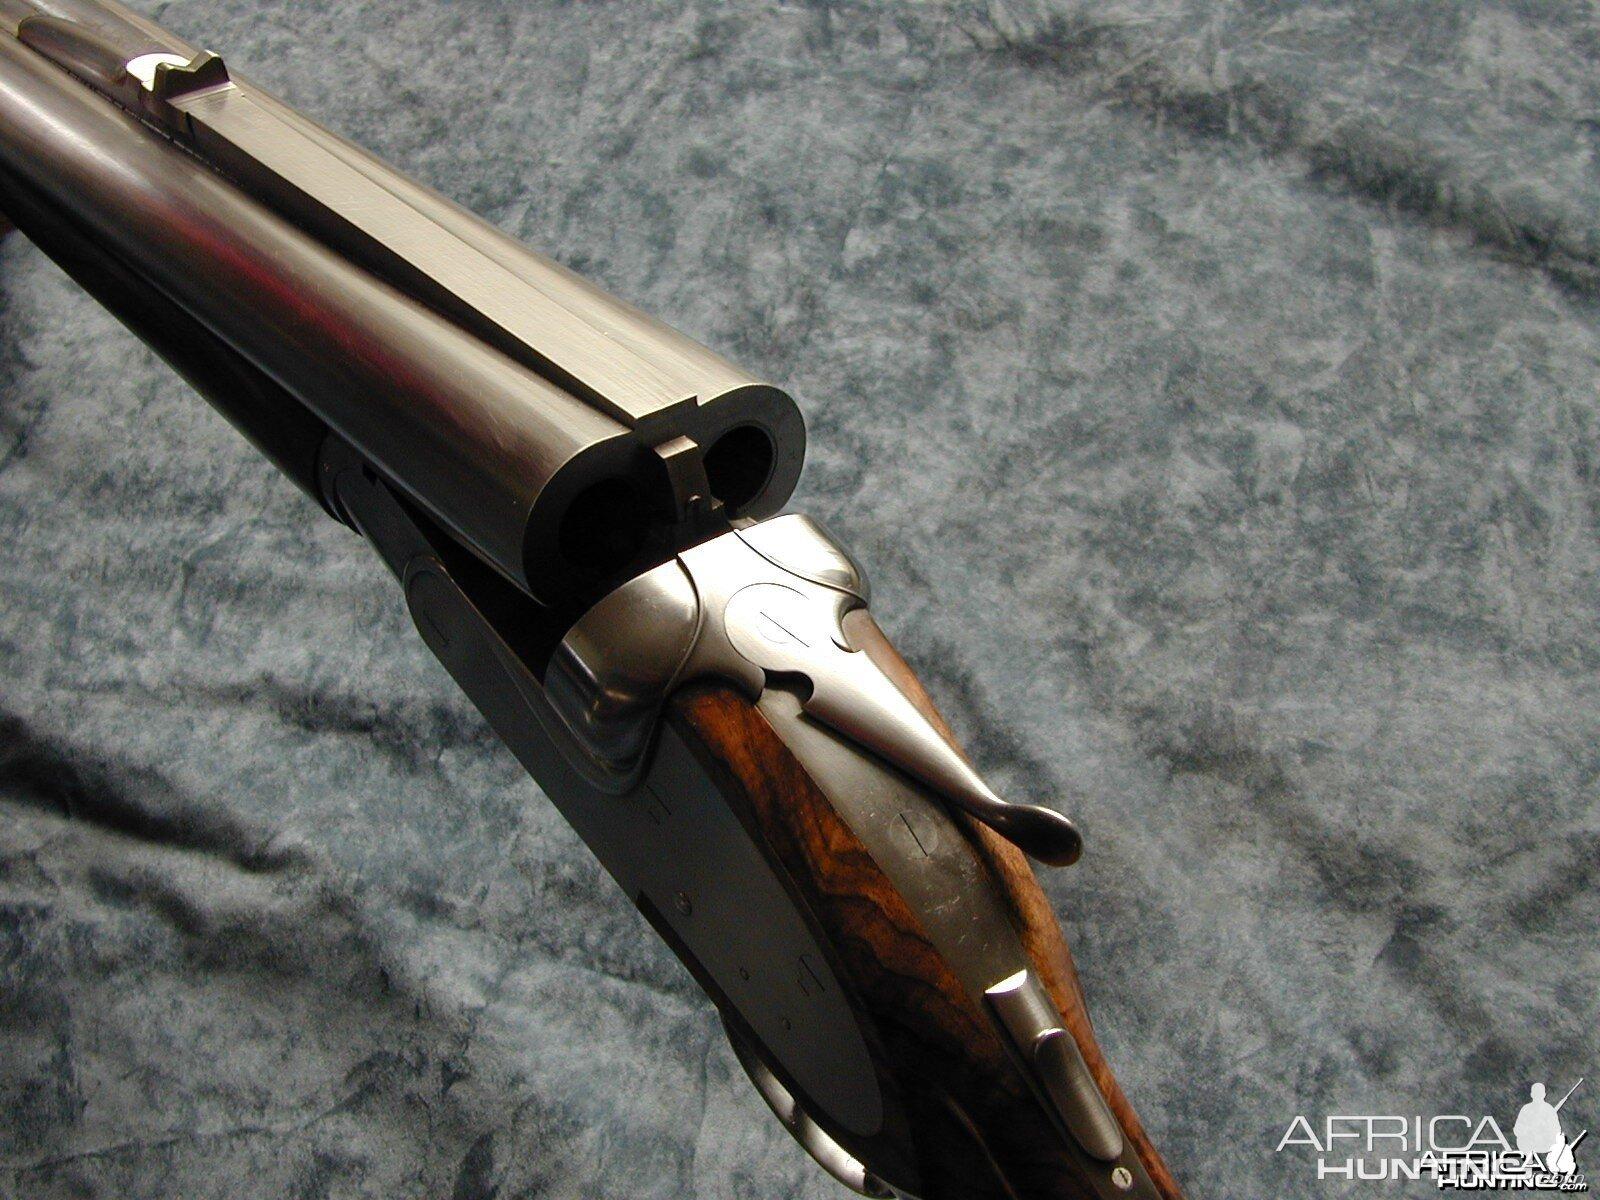 Double Rifle 750 Nitro Express made by Armitalia di ...